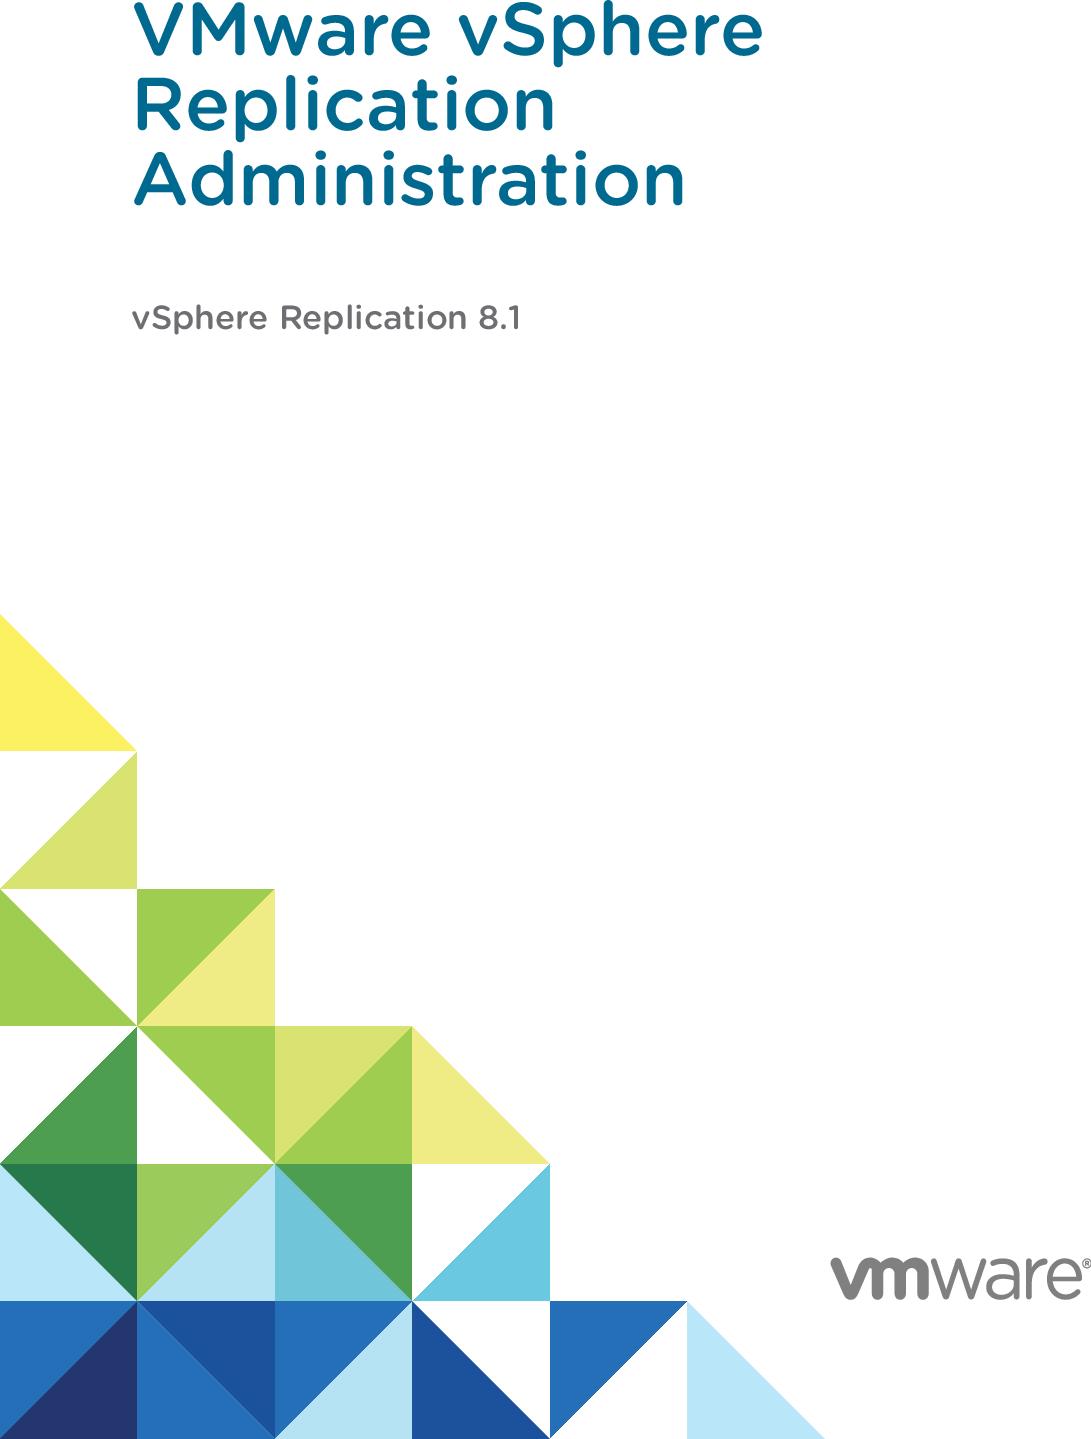 VMware VSphere Replication Administration 8 1 V Sphere 81 admin